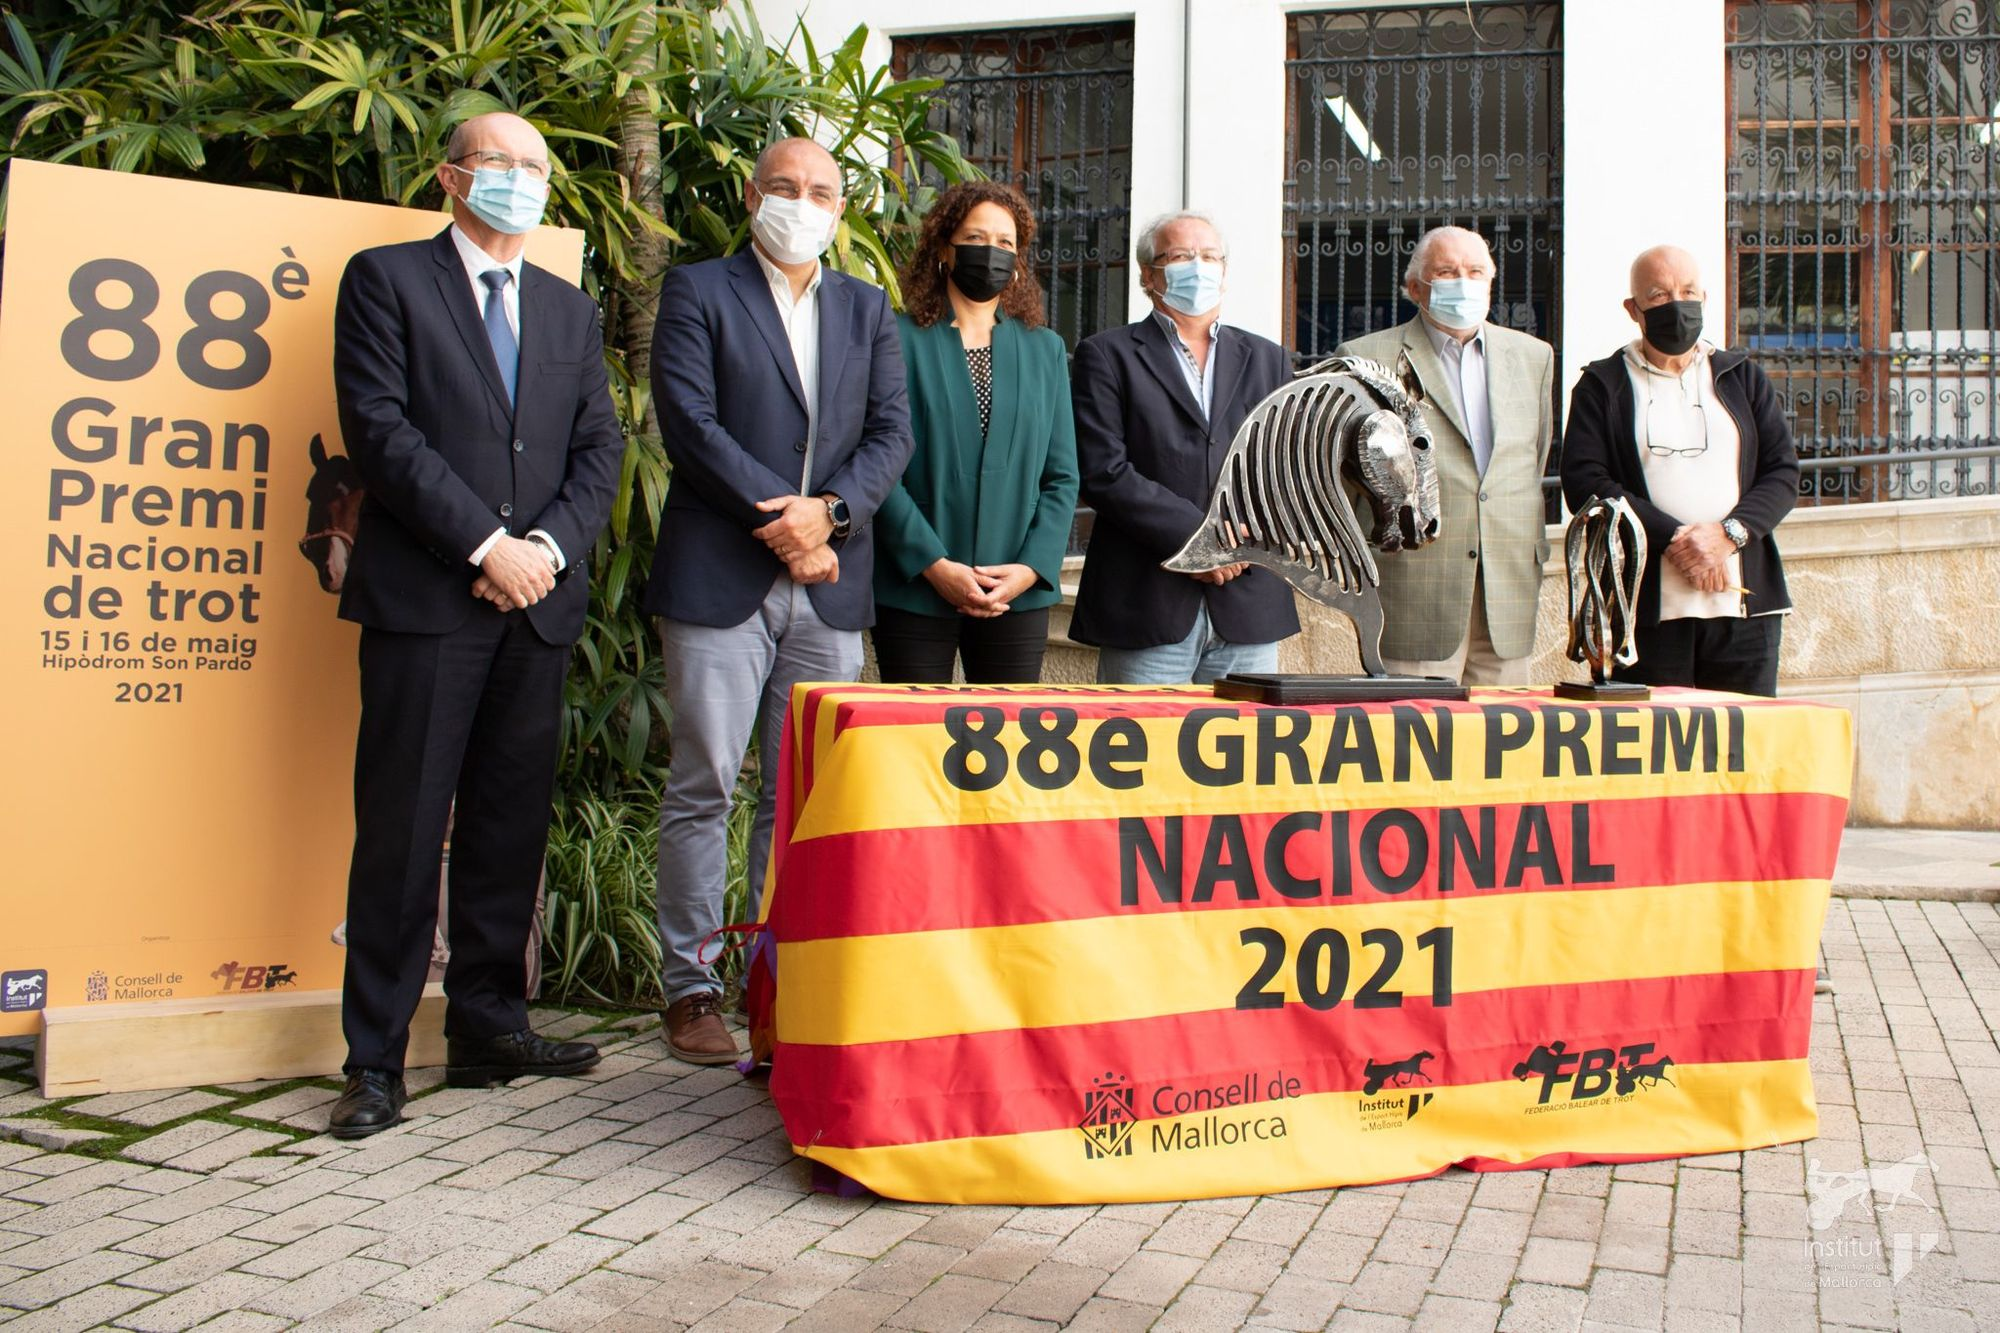 Presentación del 88è Gran Premi Nacional de Trot